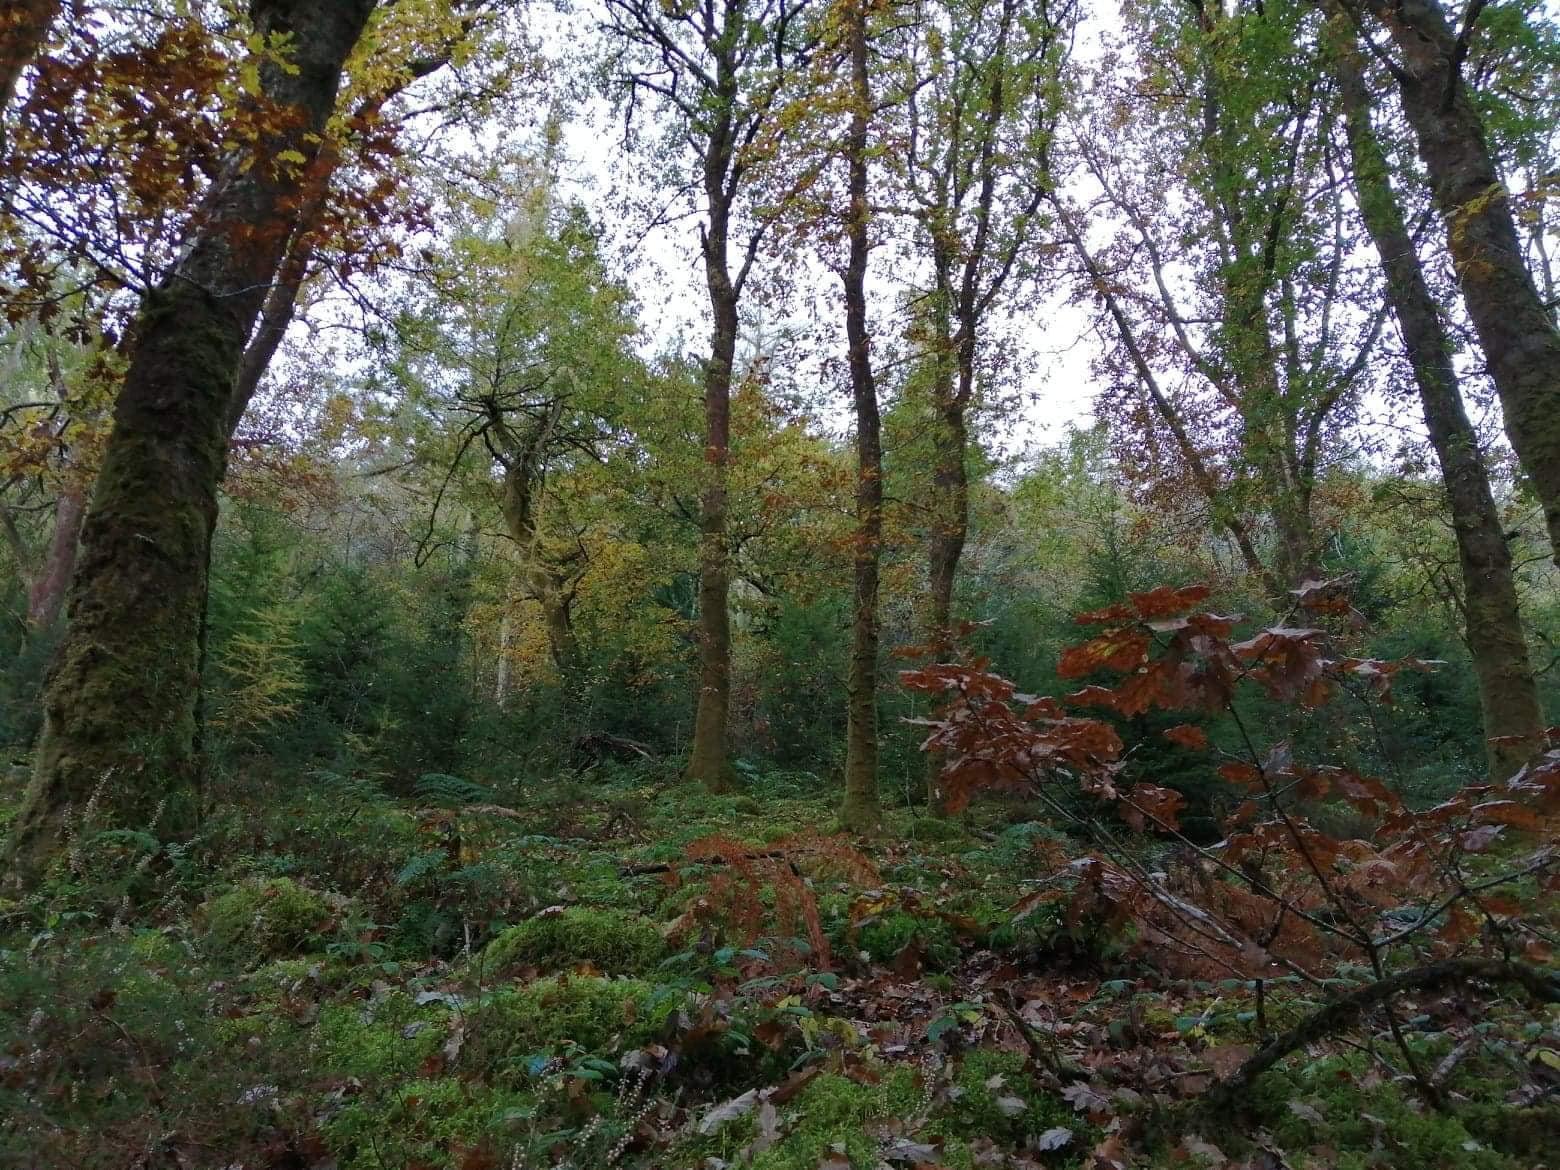 Brechfa Forest, Abergorlech, Carmarthenshire, Wales